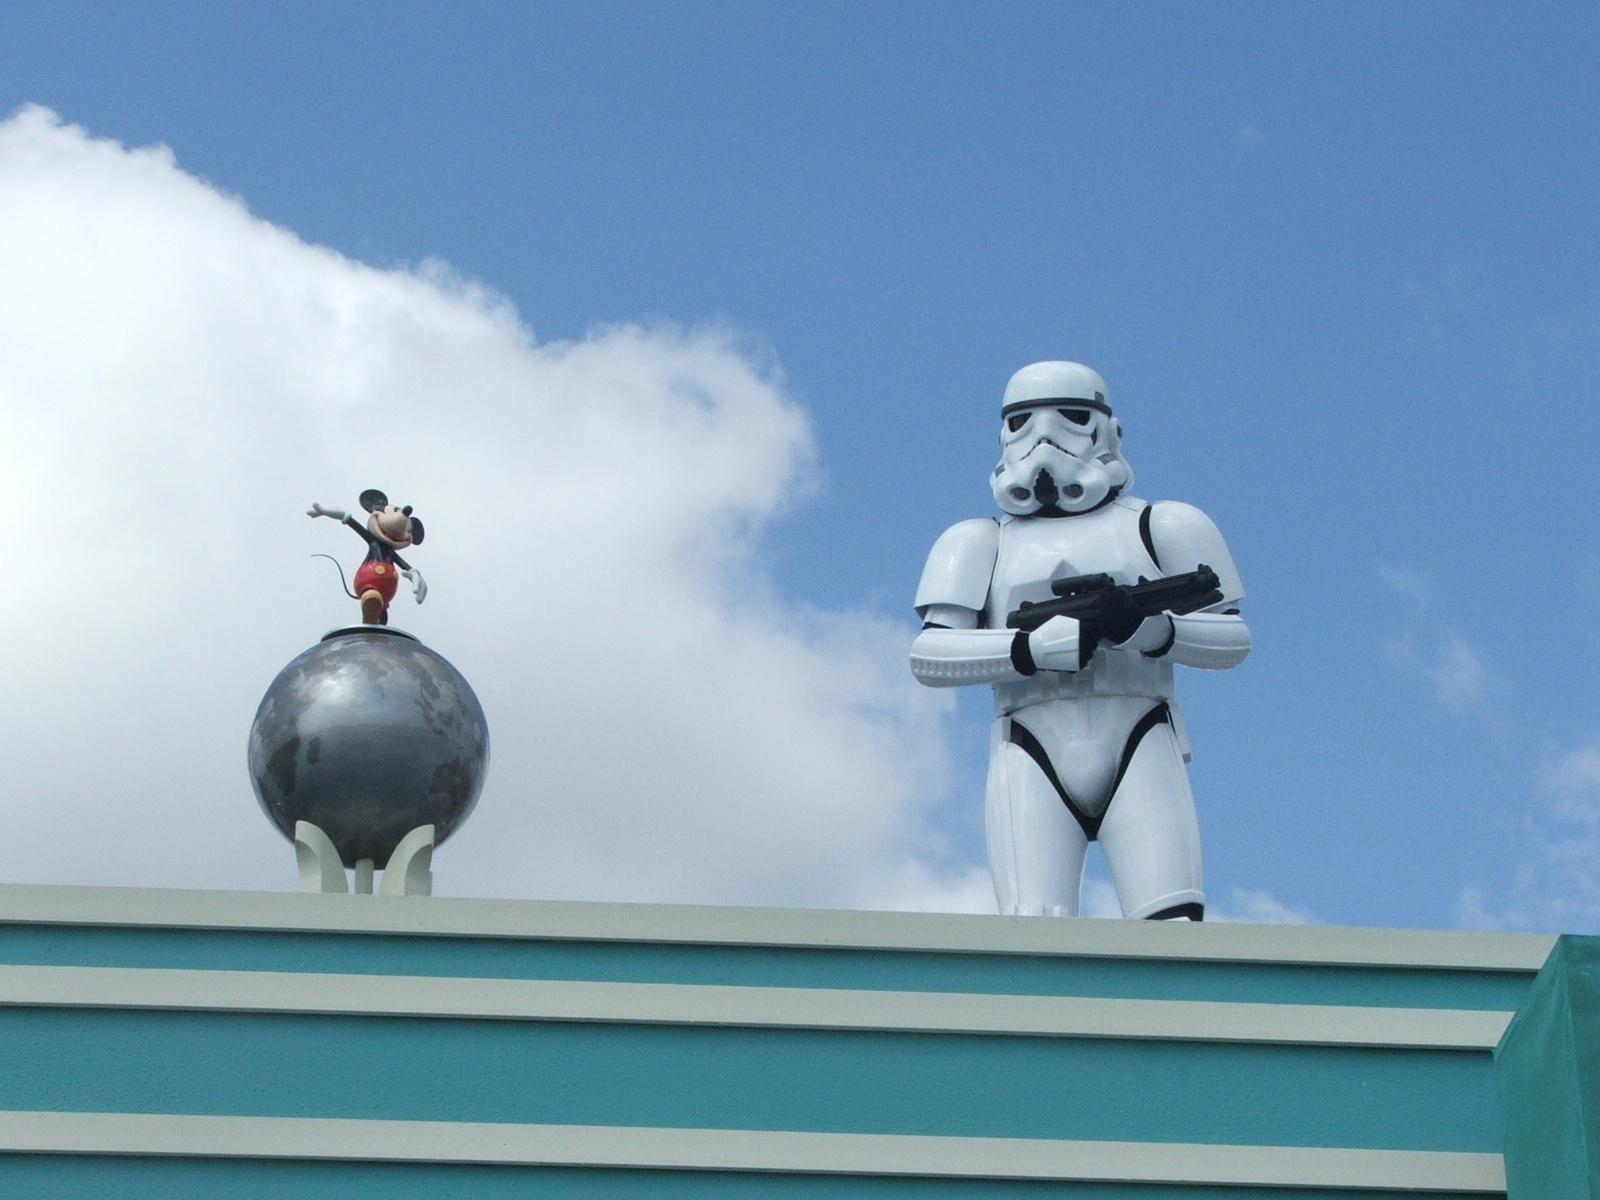 Stormtrooper at Disney by F J Bering